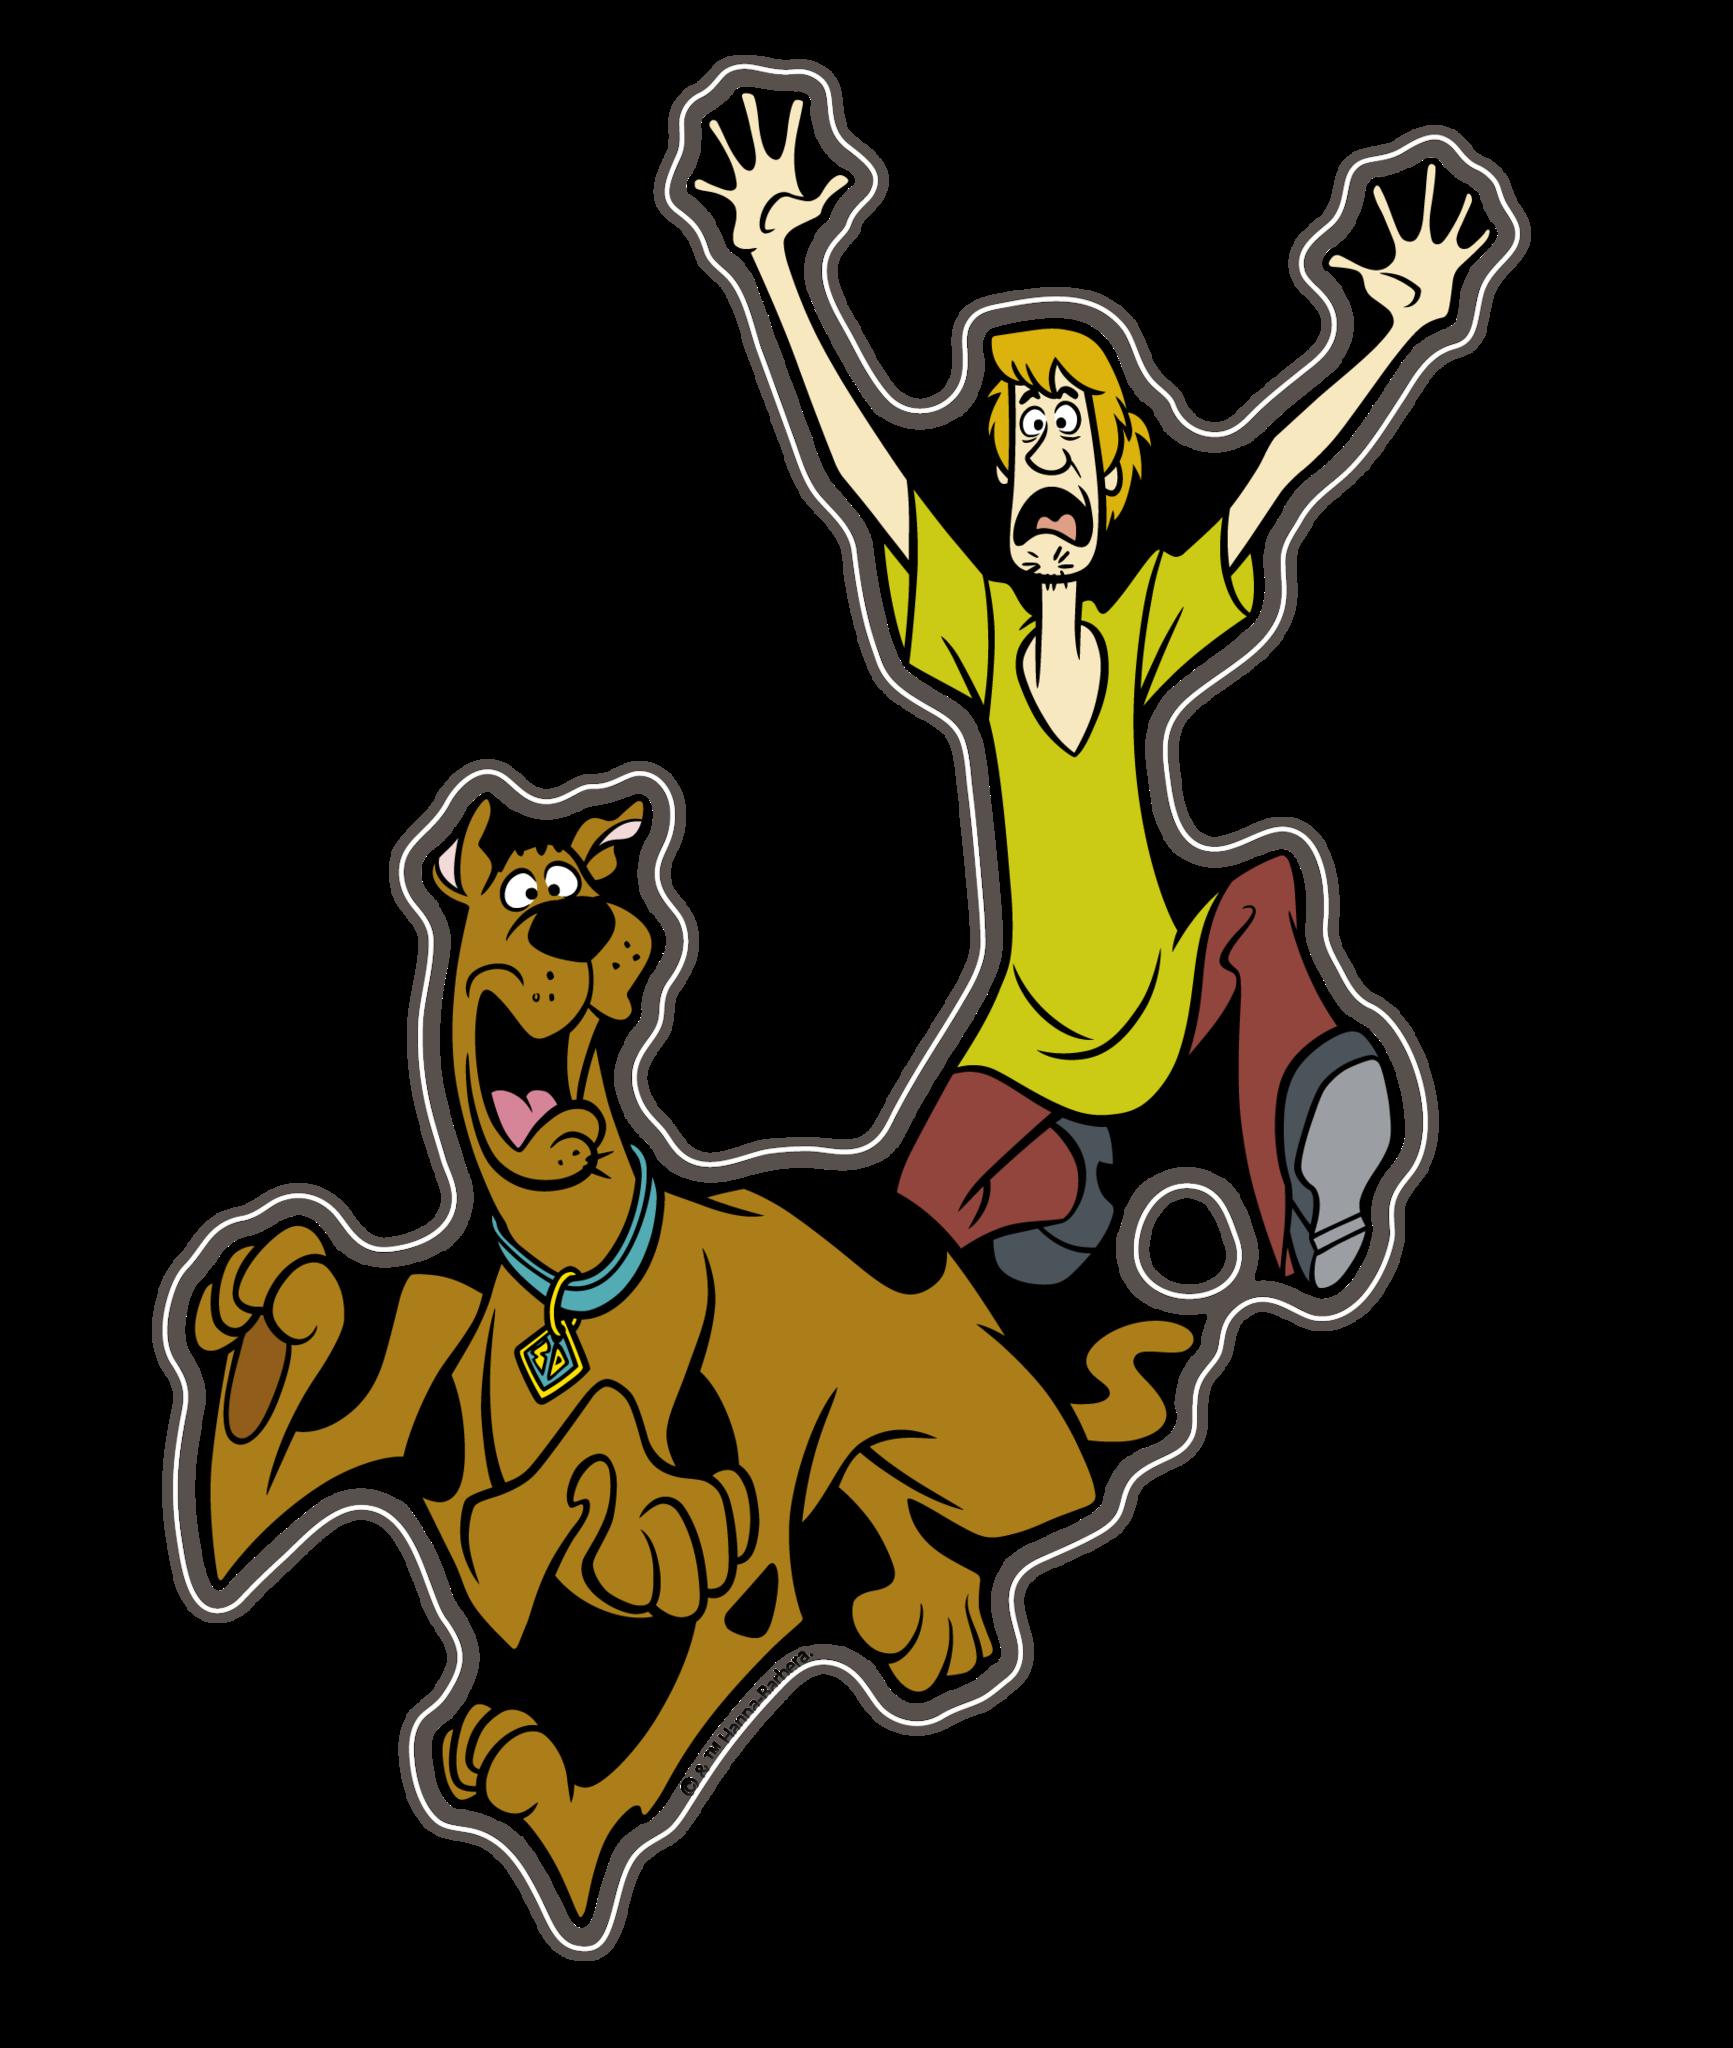 Shaggy cartoon transprent scoobydoo. Scooby doo clipart rogers